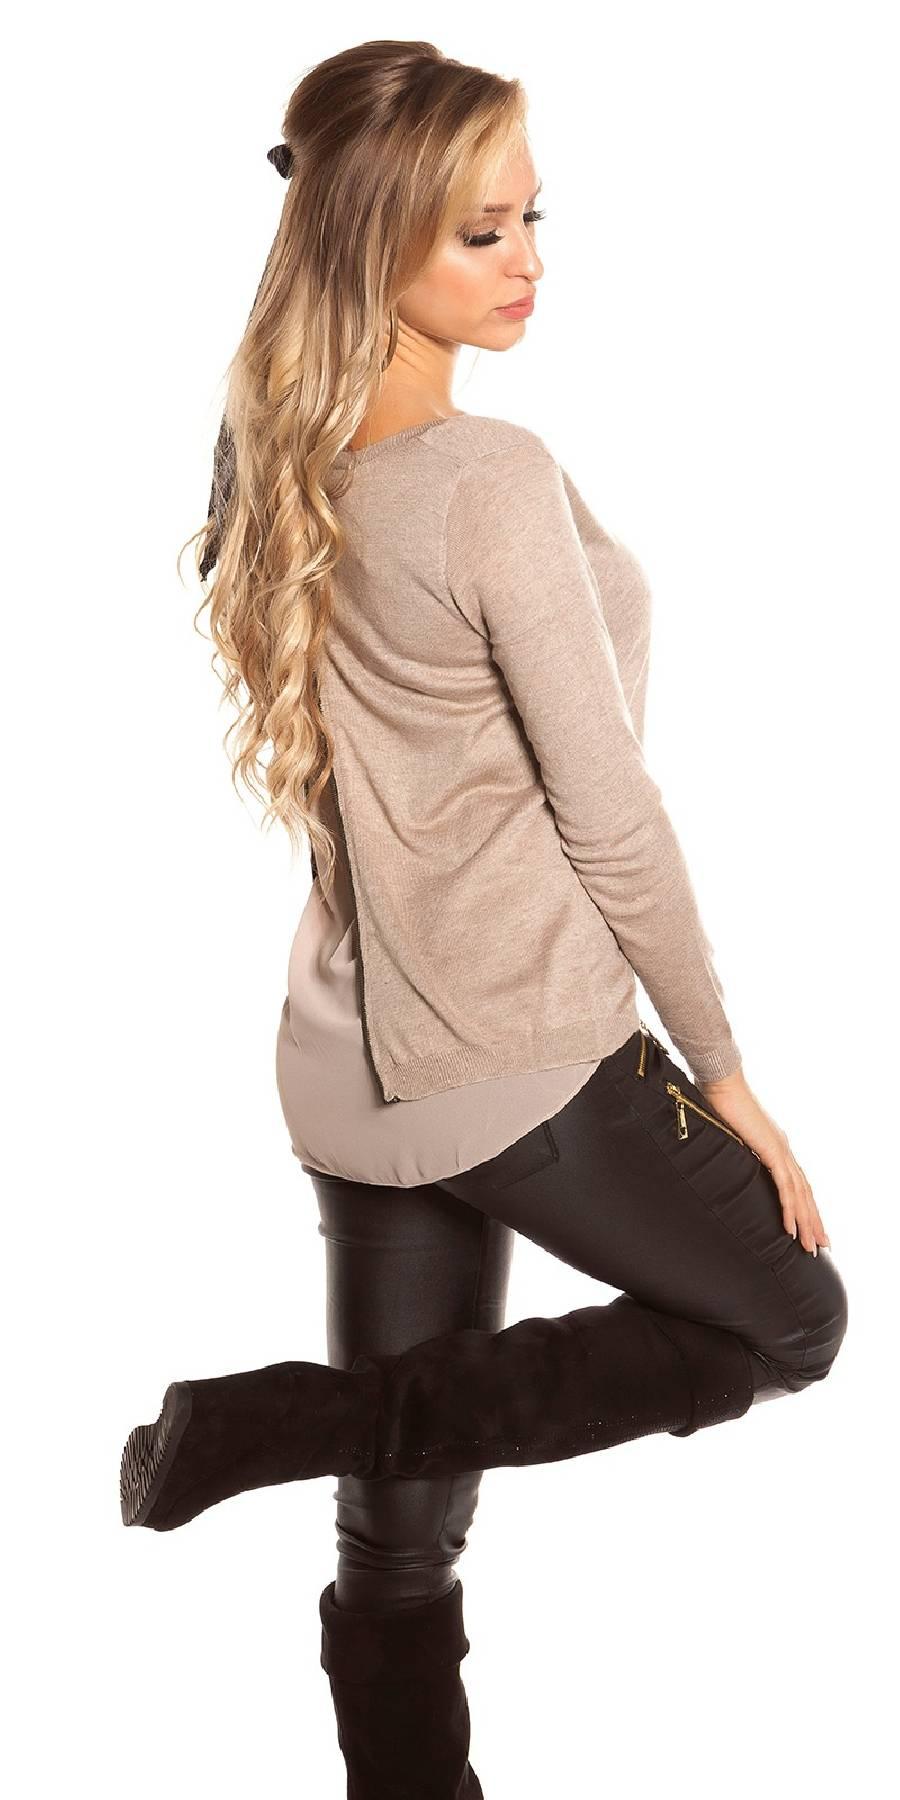 Pantalon look fashion tendance 2012 couleur noir